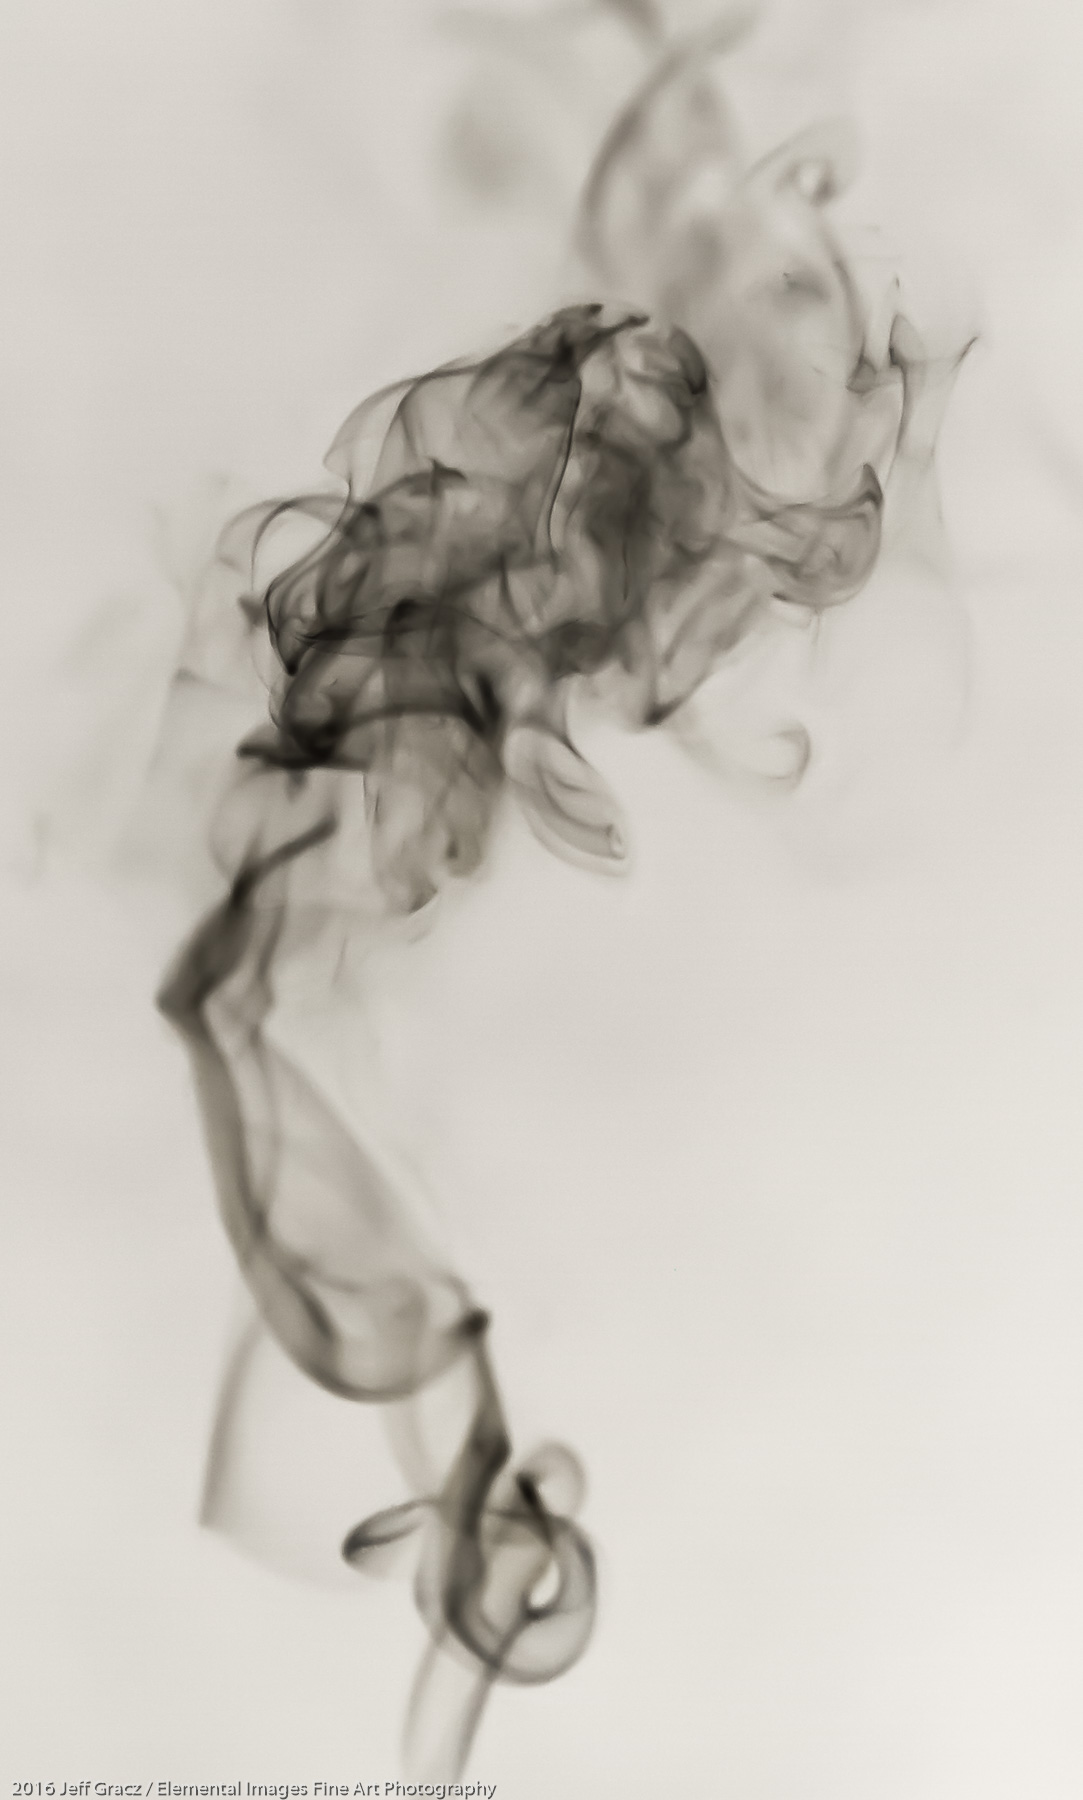 Smoke 18 | Vancouver | WA | USA - © 2016 Jeff Gracz / Elemental Images Fine Art Photography - All Rights Reserved Worldwide